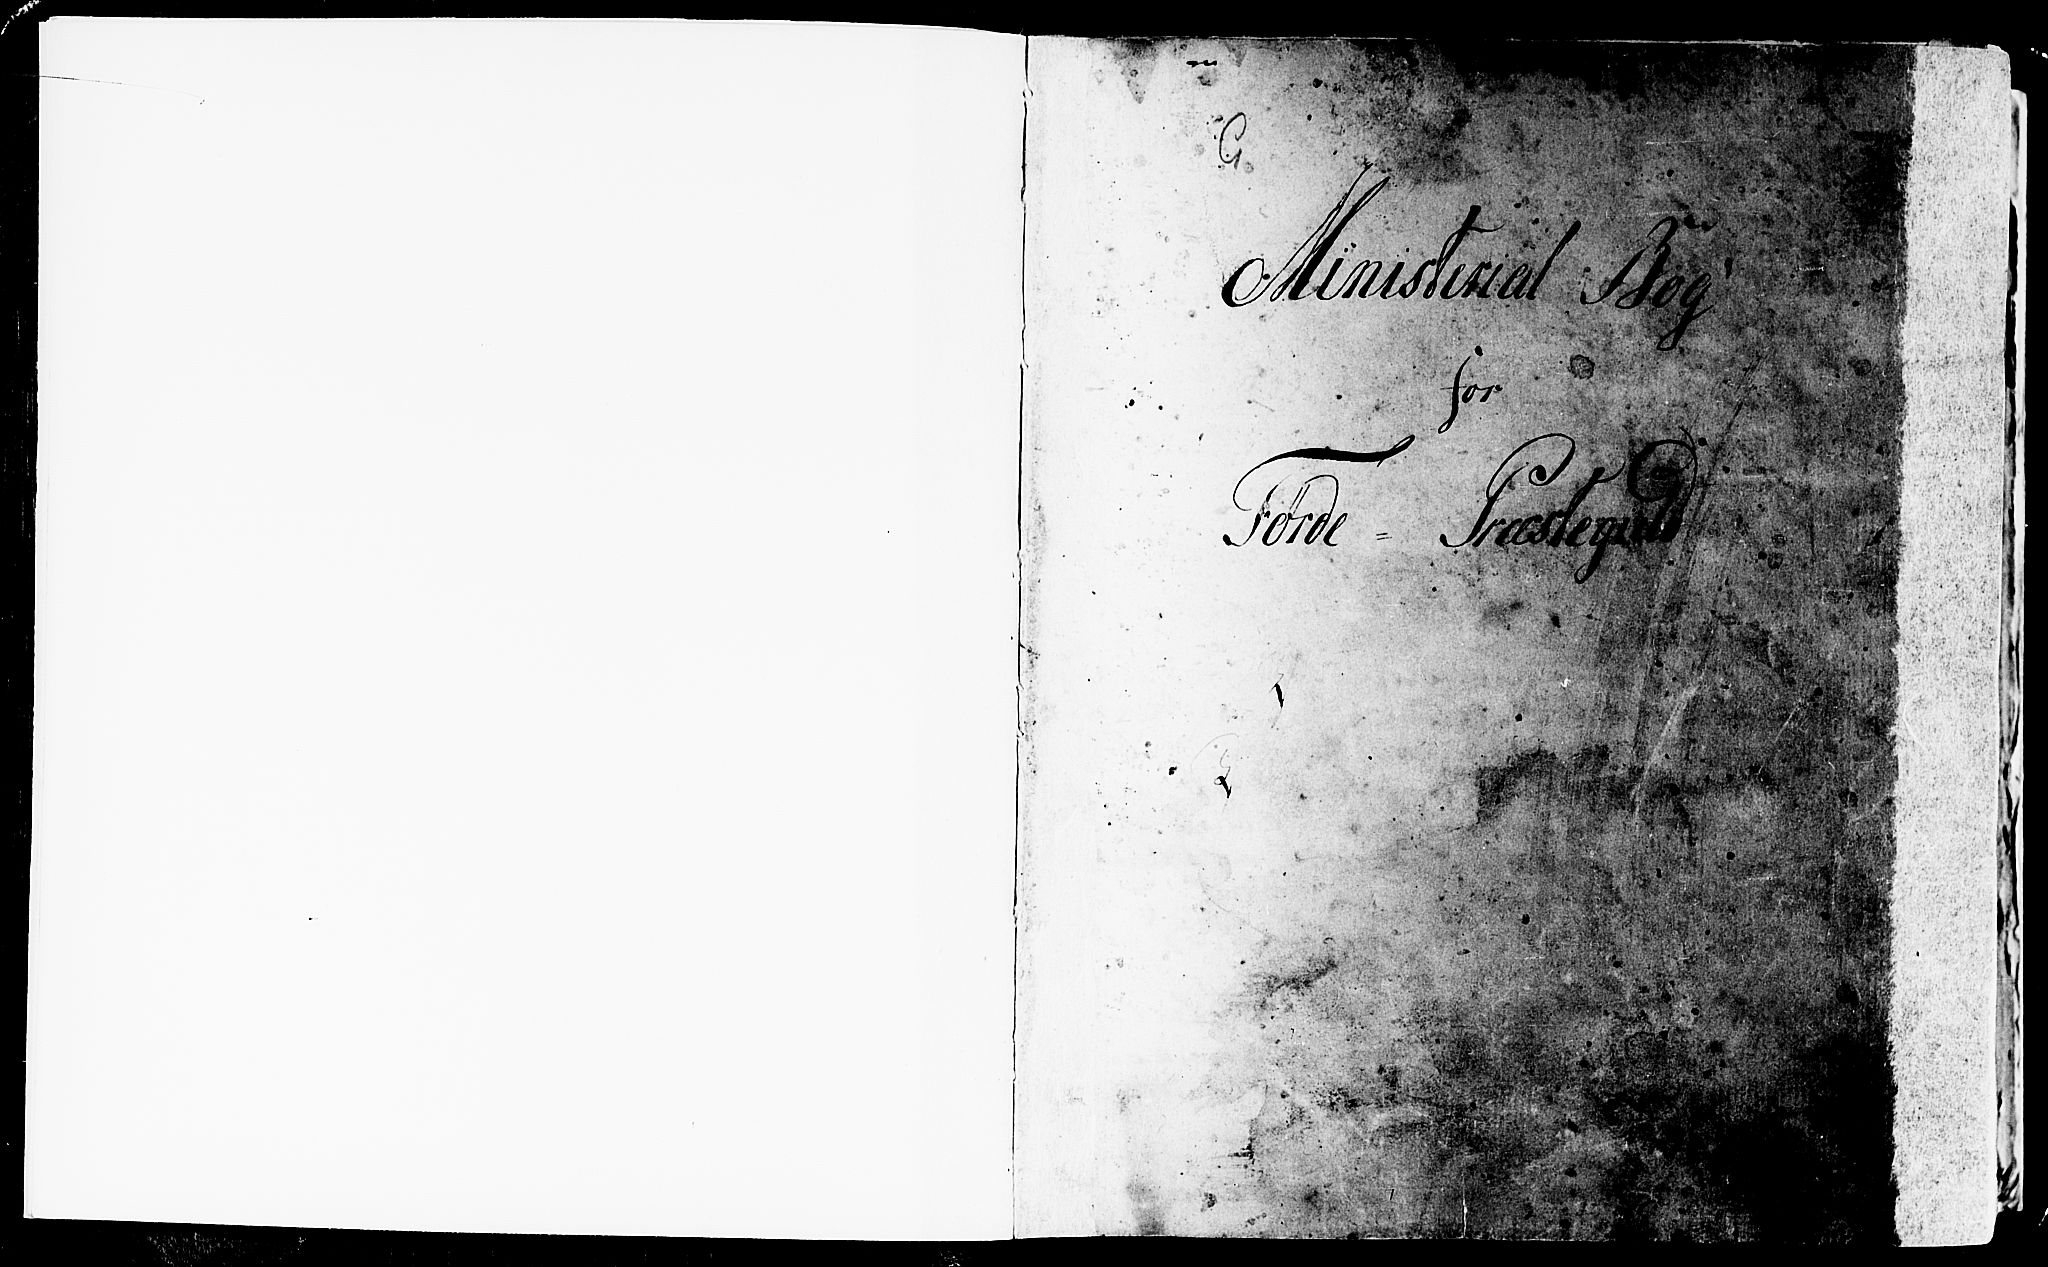 SAB, Førde Sokneprestembete, H/Haa: Ministerialbok nr. A 4, 1781-1803, s. 0-1